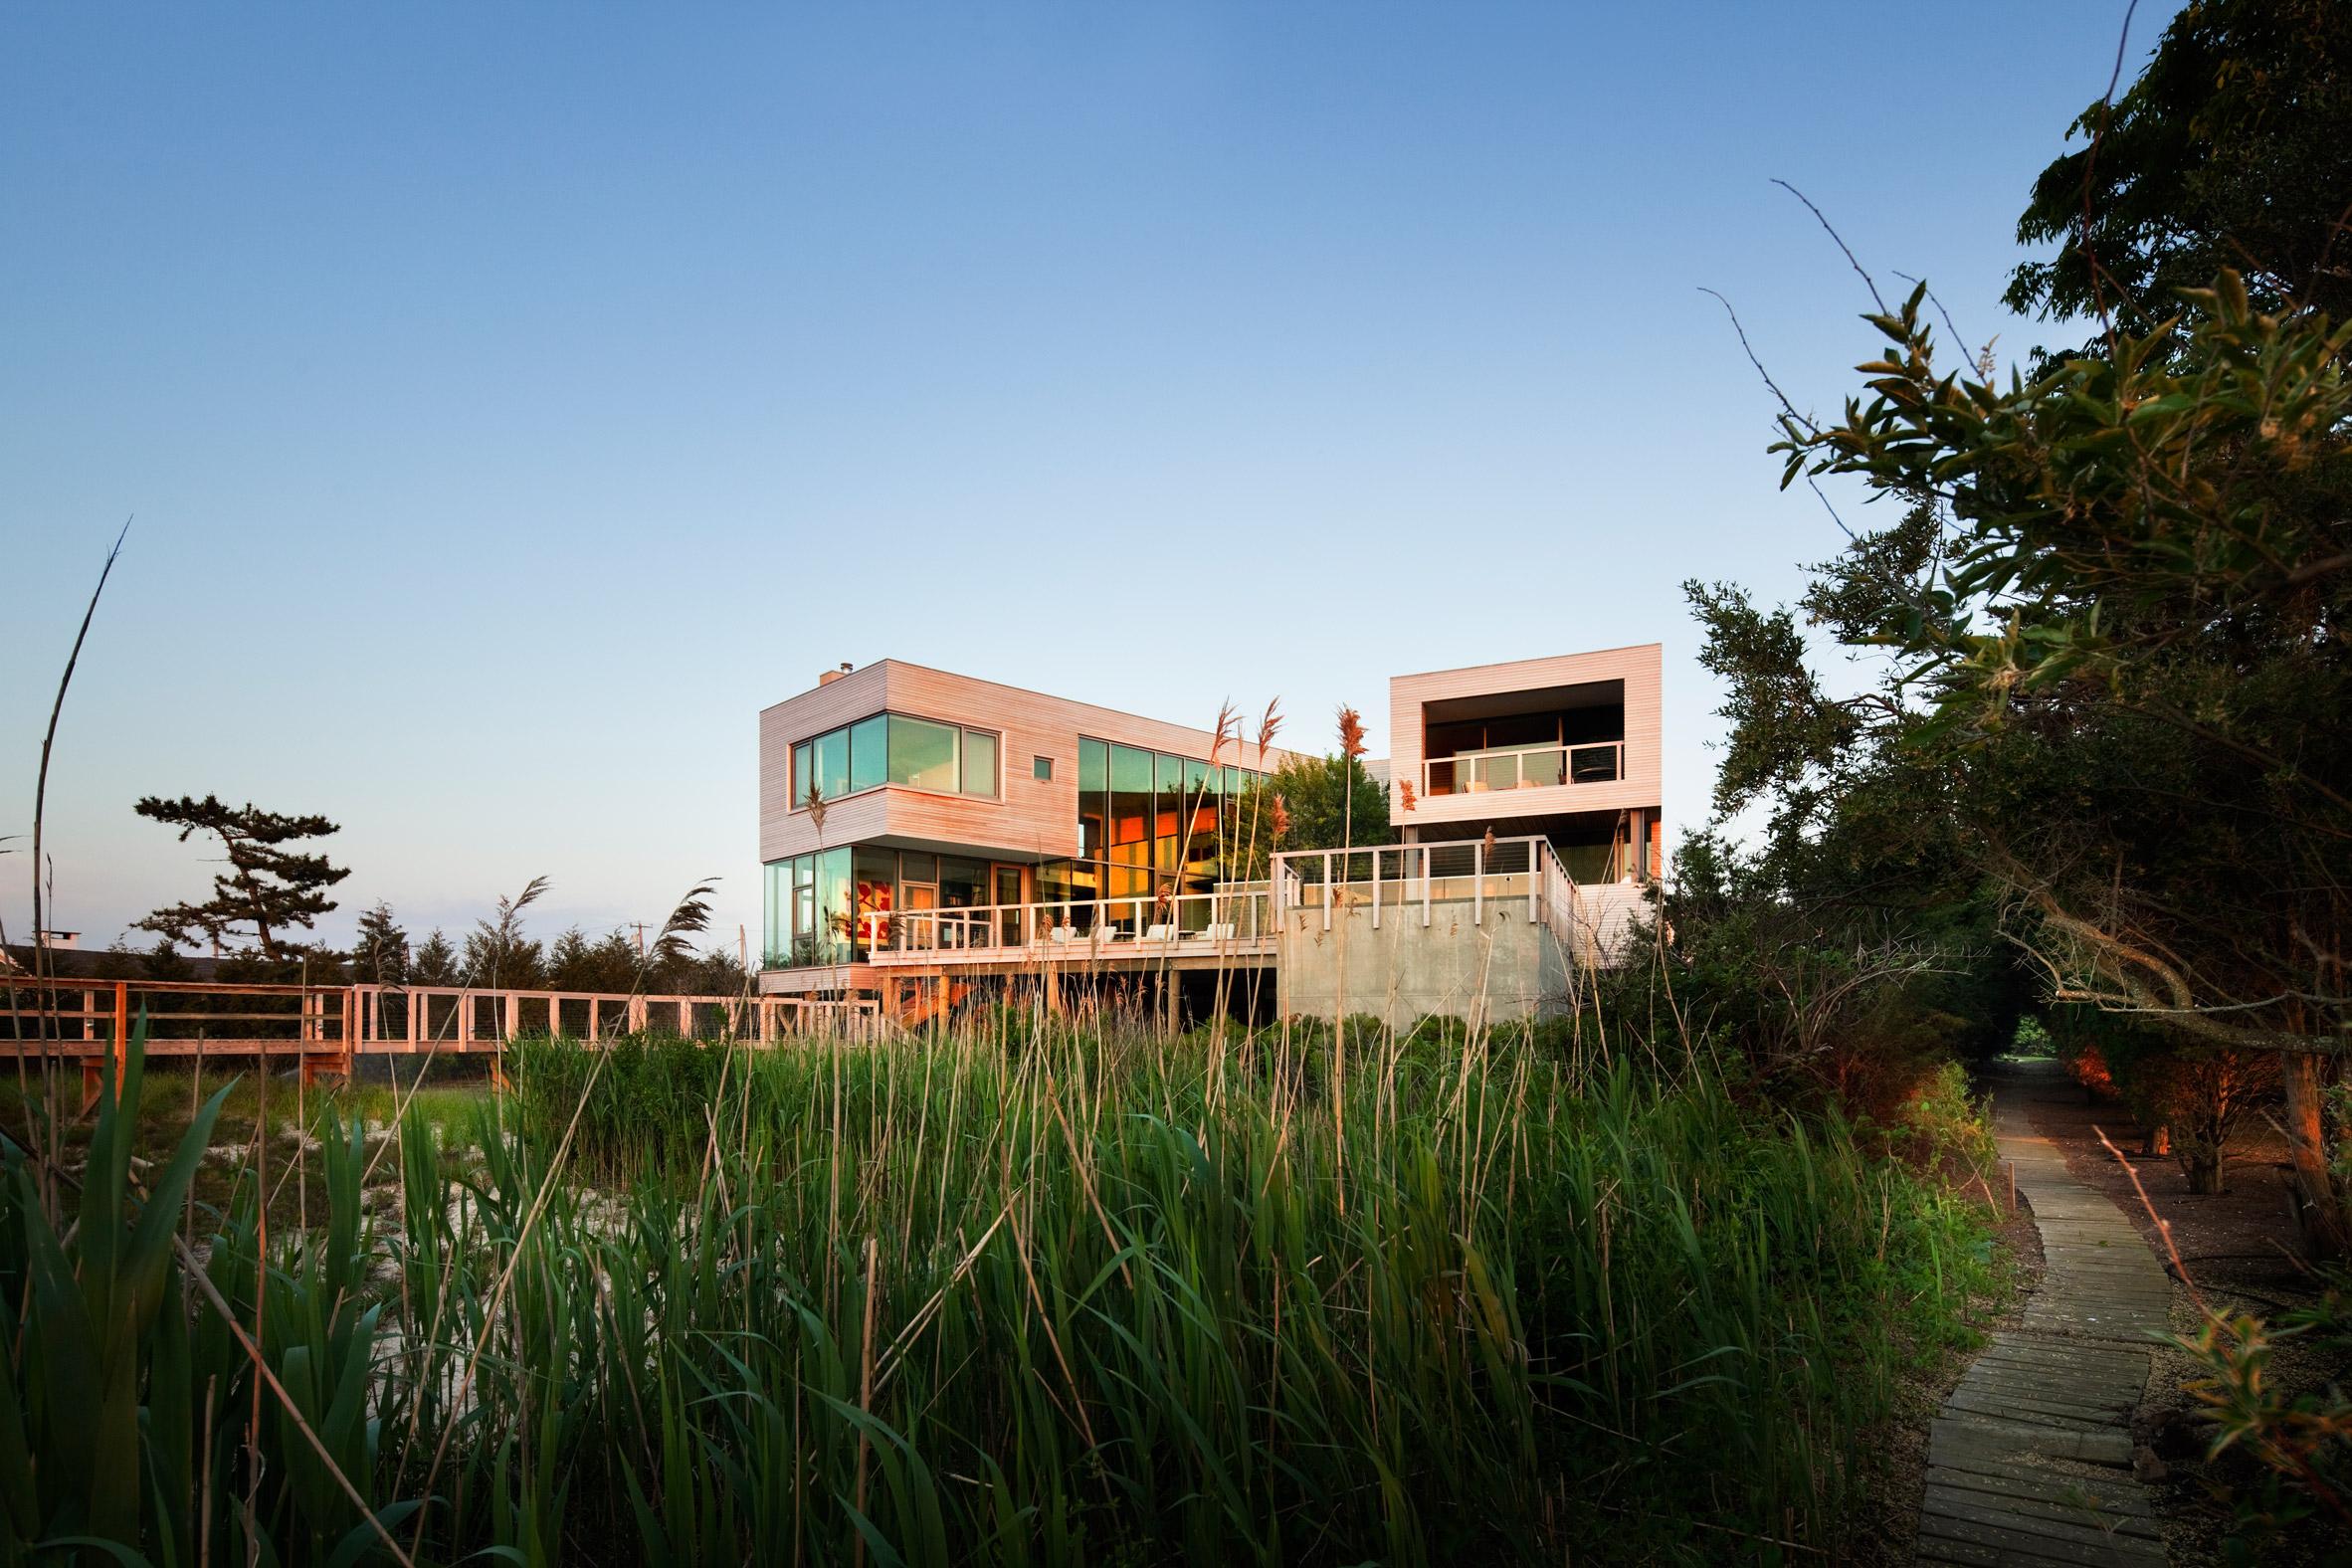 New York City architects Leroy Street Studio design Bay House